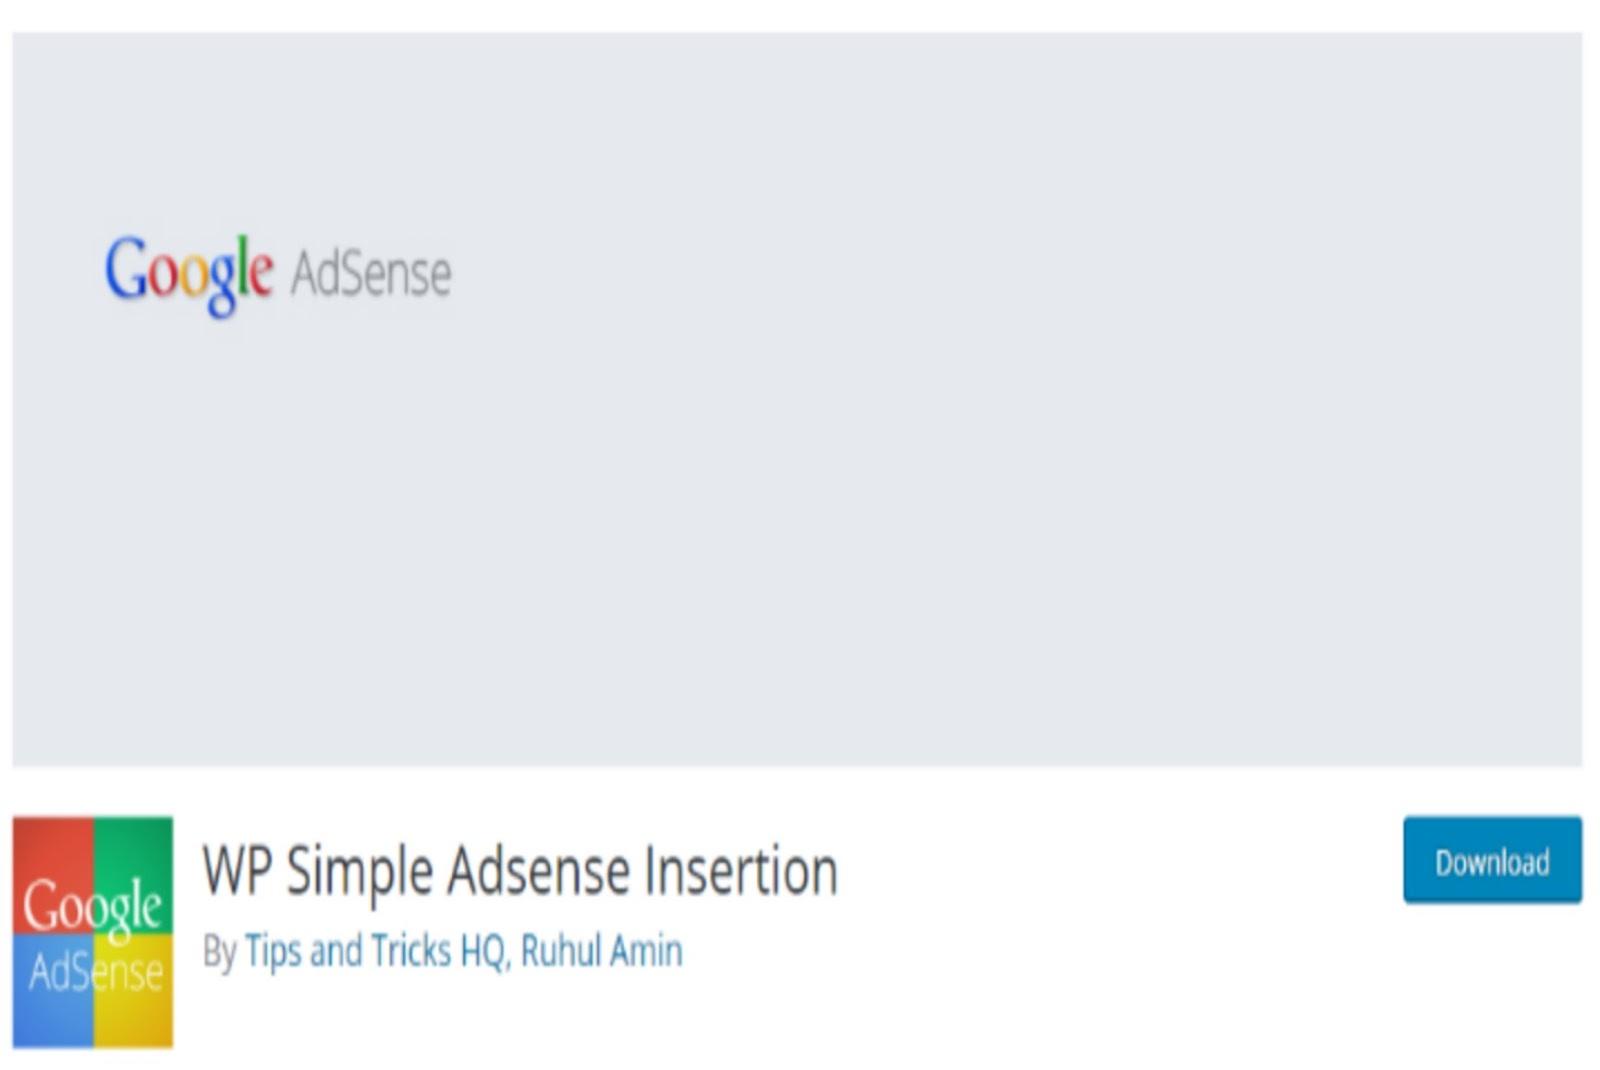 WP Simple Adsense Insertion WordPress Plugin